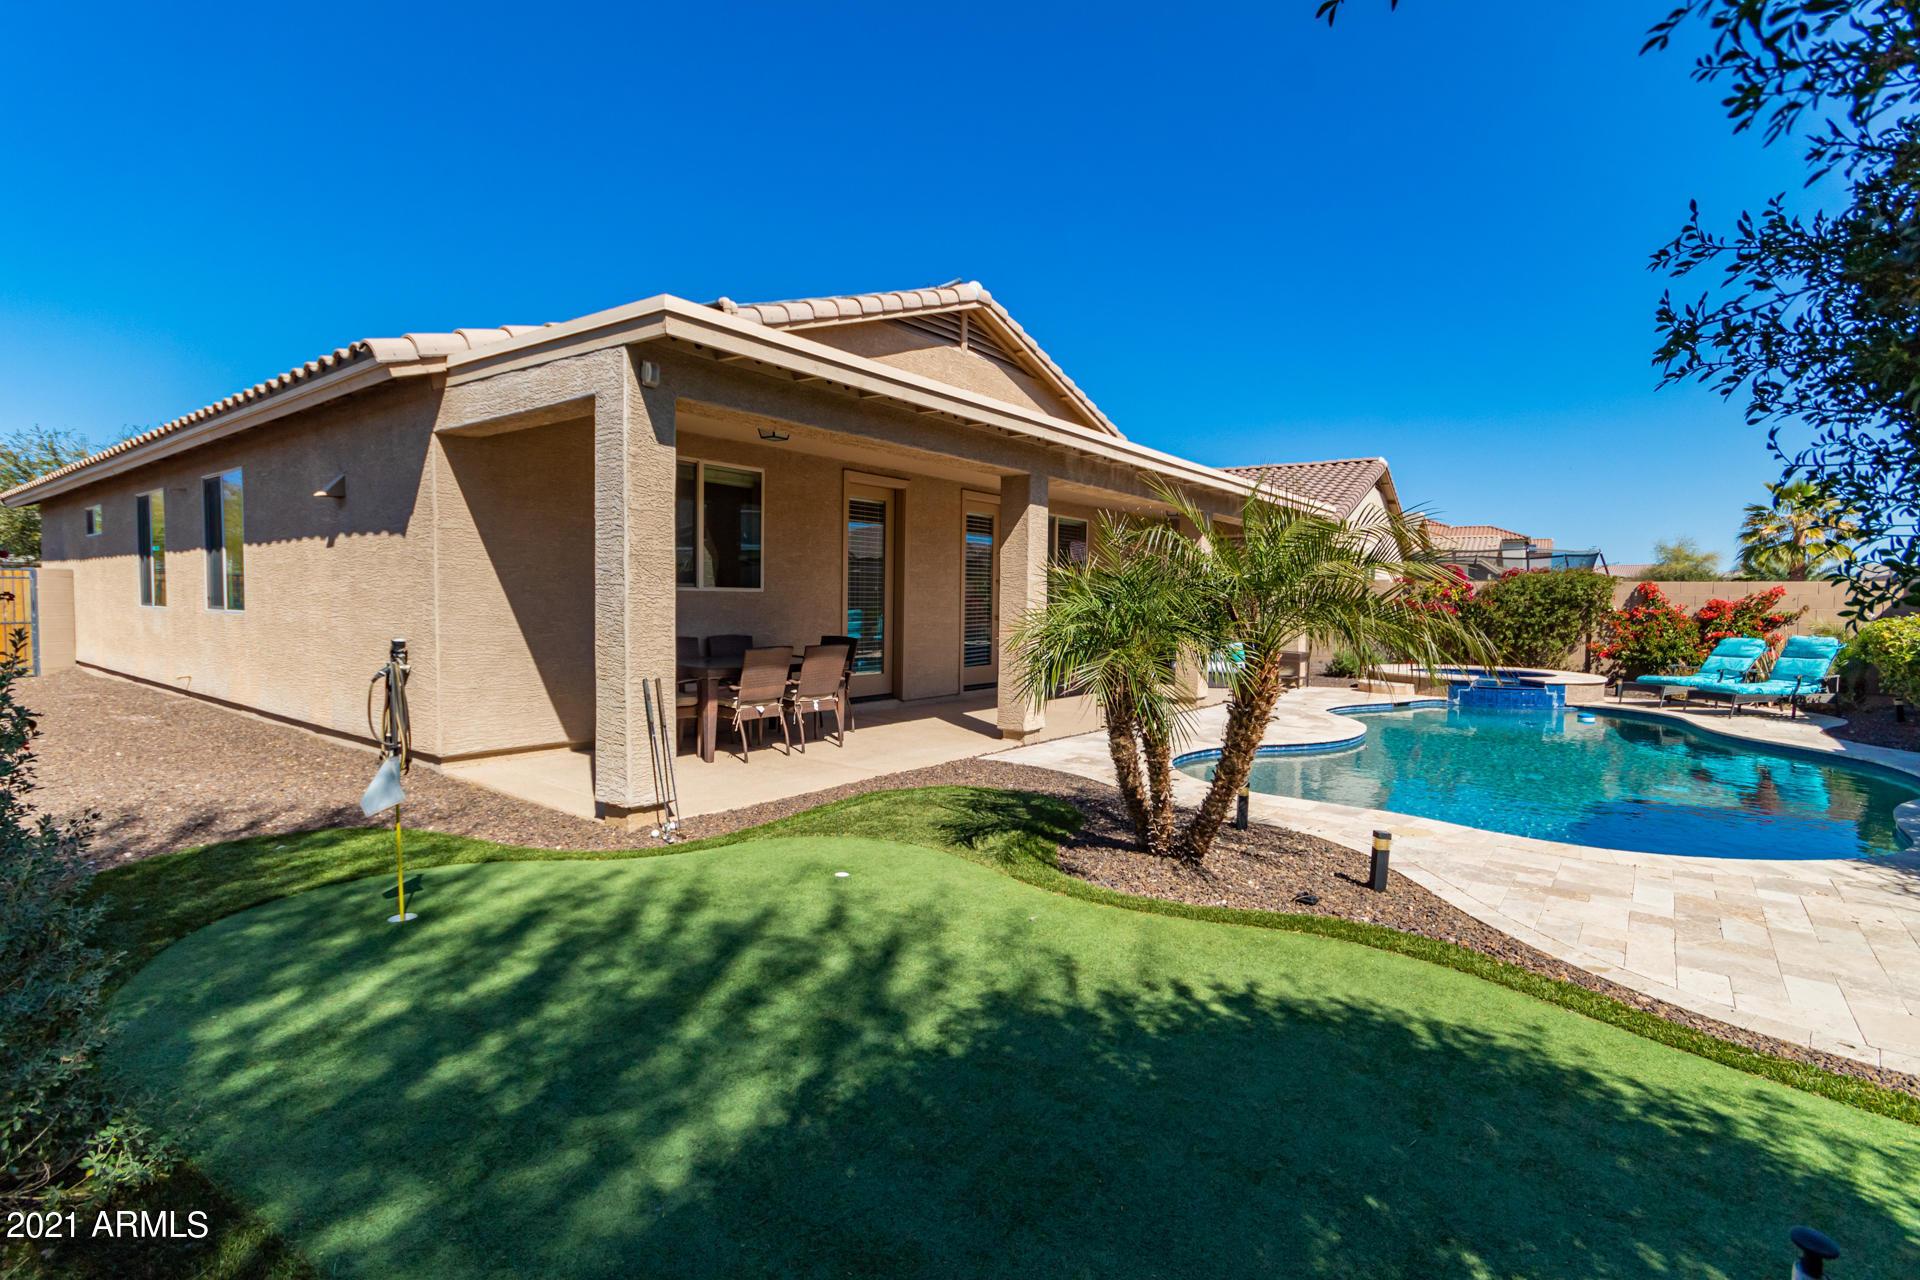 36113 N RED RIVER Court, San Tan Valley, AZ 85143, 4 Bedrooms Bedrooms, ,Residential,For Sale,36113 N RED RIVER Court,6203862